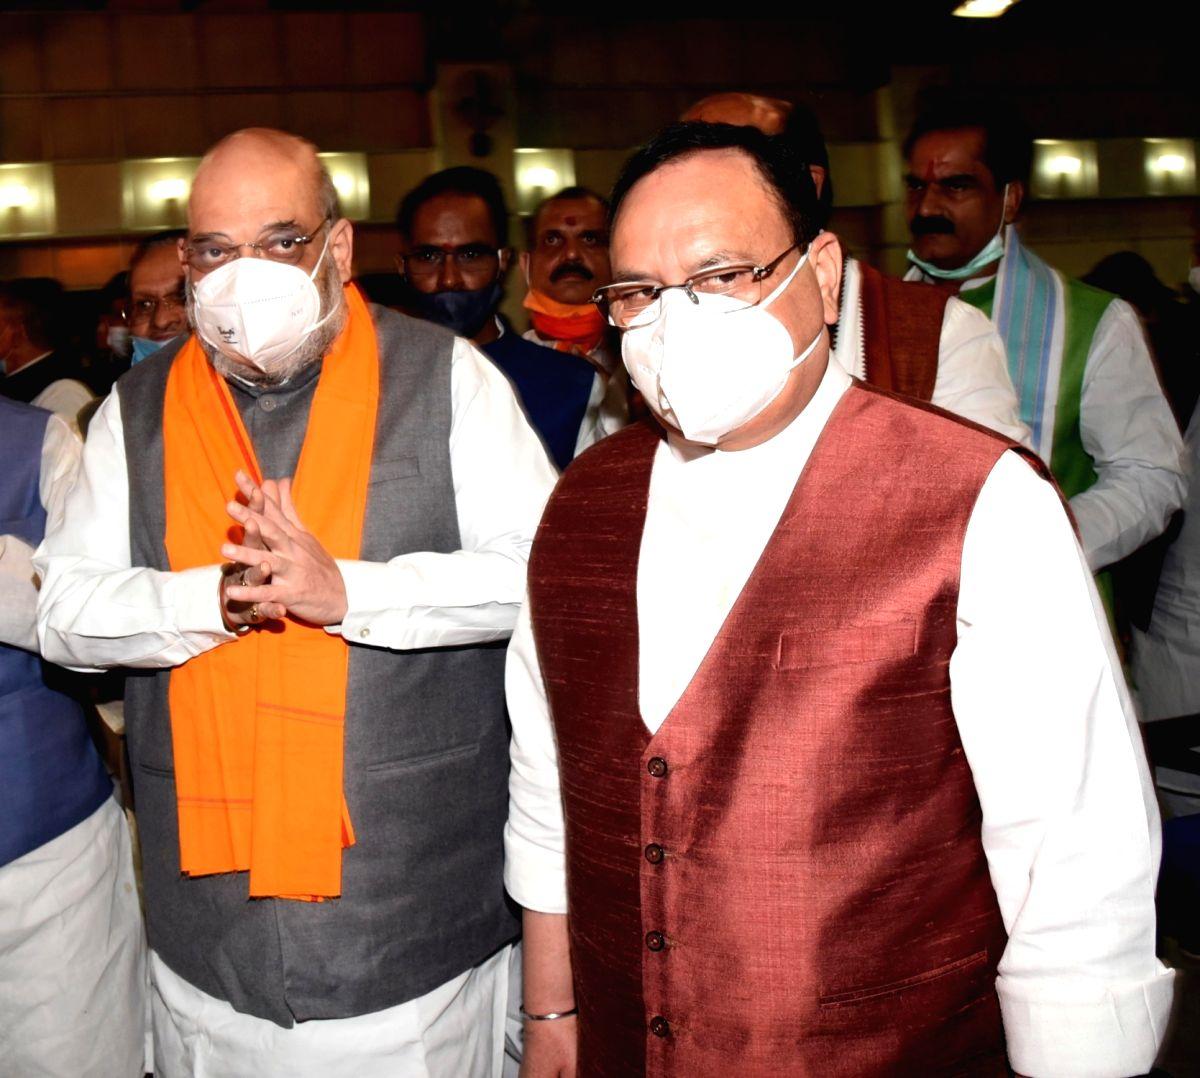 Shah, Nadda meet WB leaders to shortlist candidates